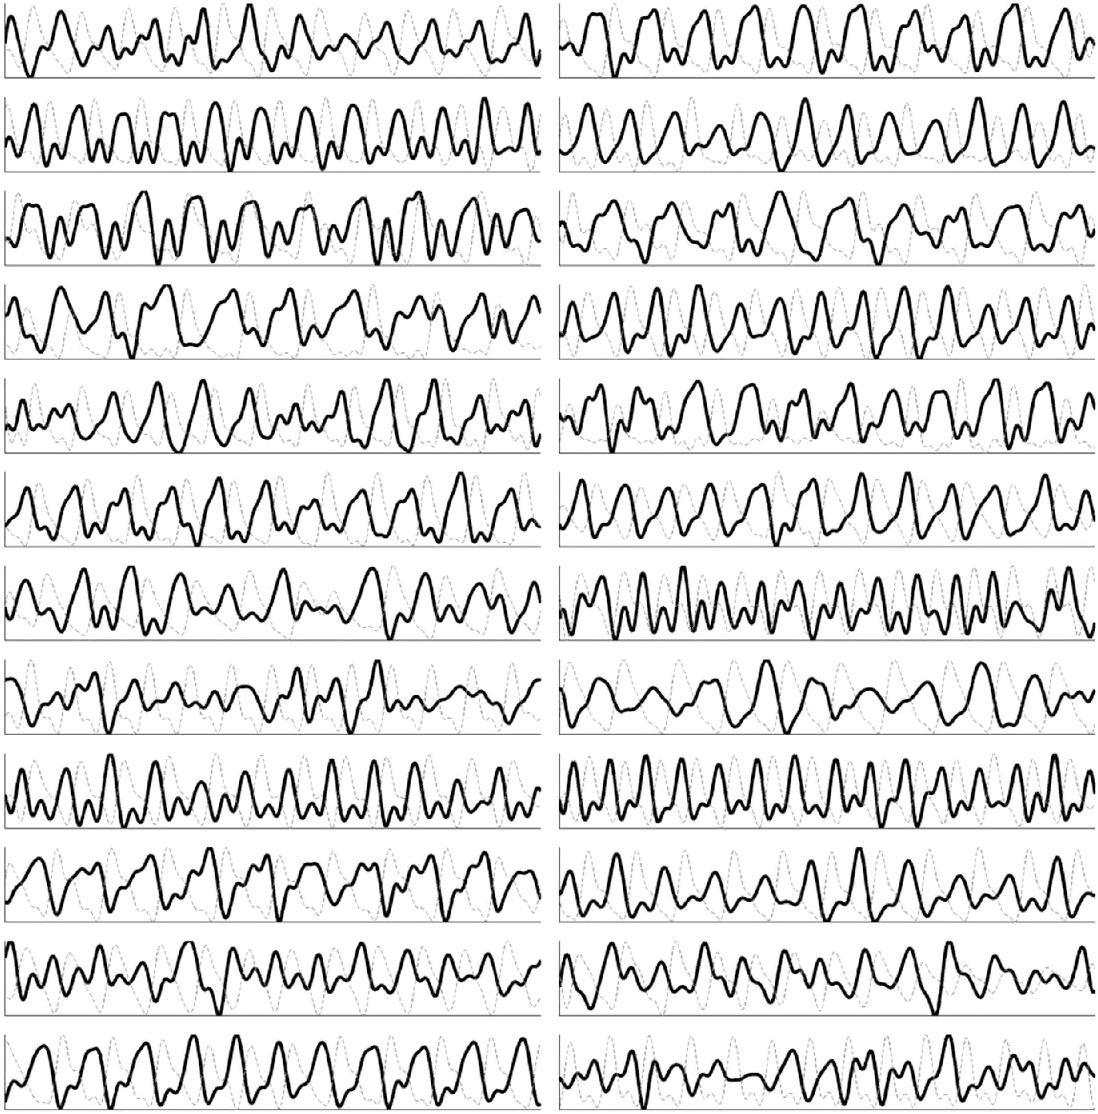 Figure 4 for Non-contact hemodynamic imaging reveals the jugular venous pulse waveform